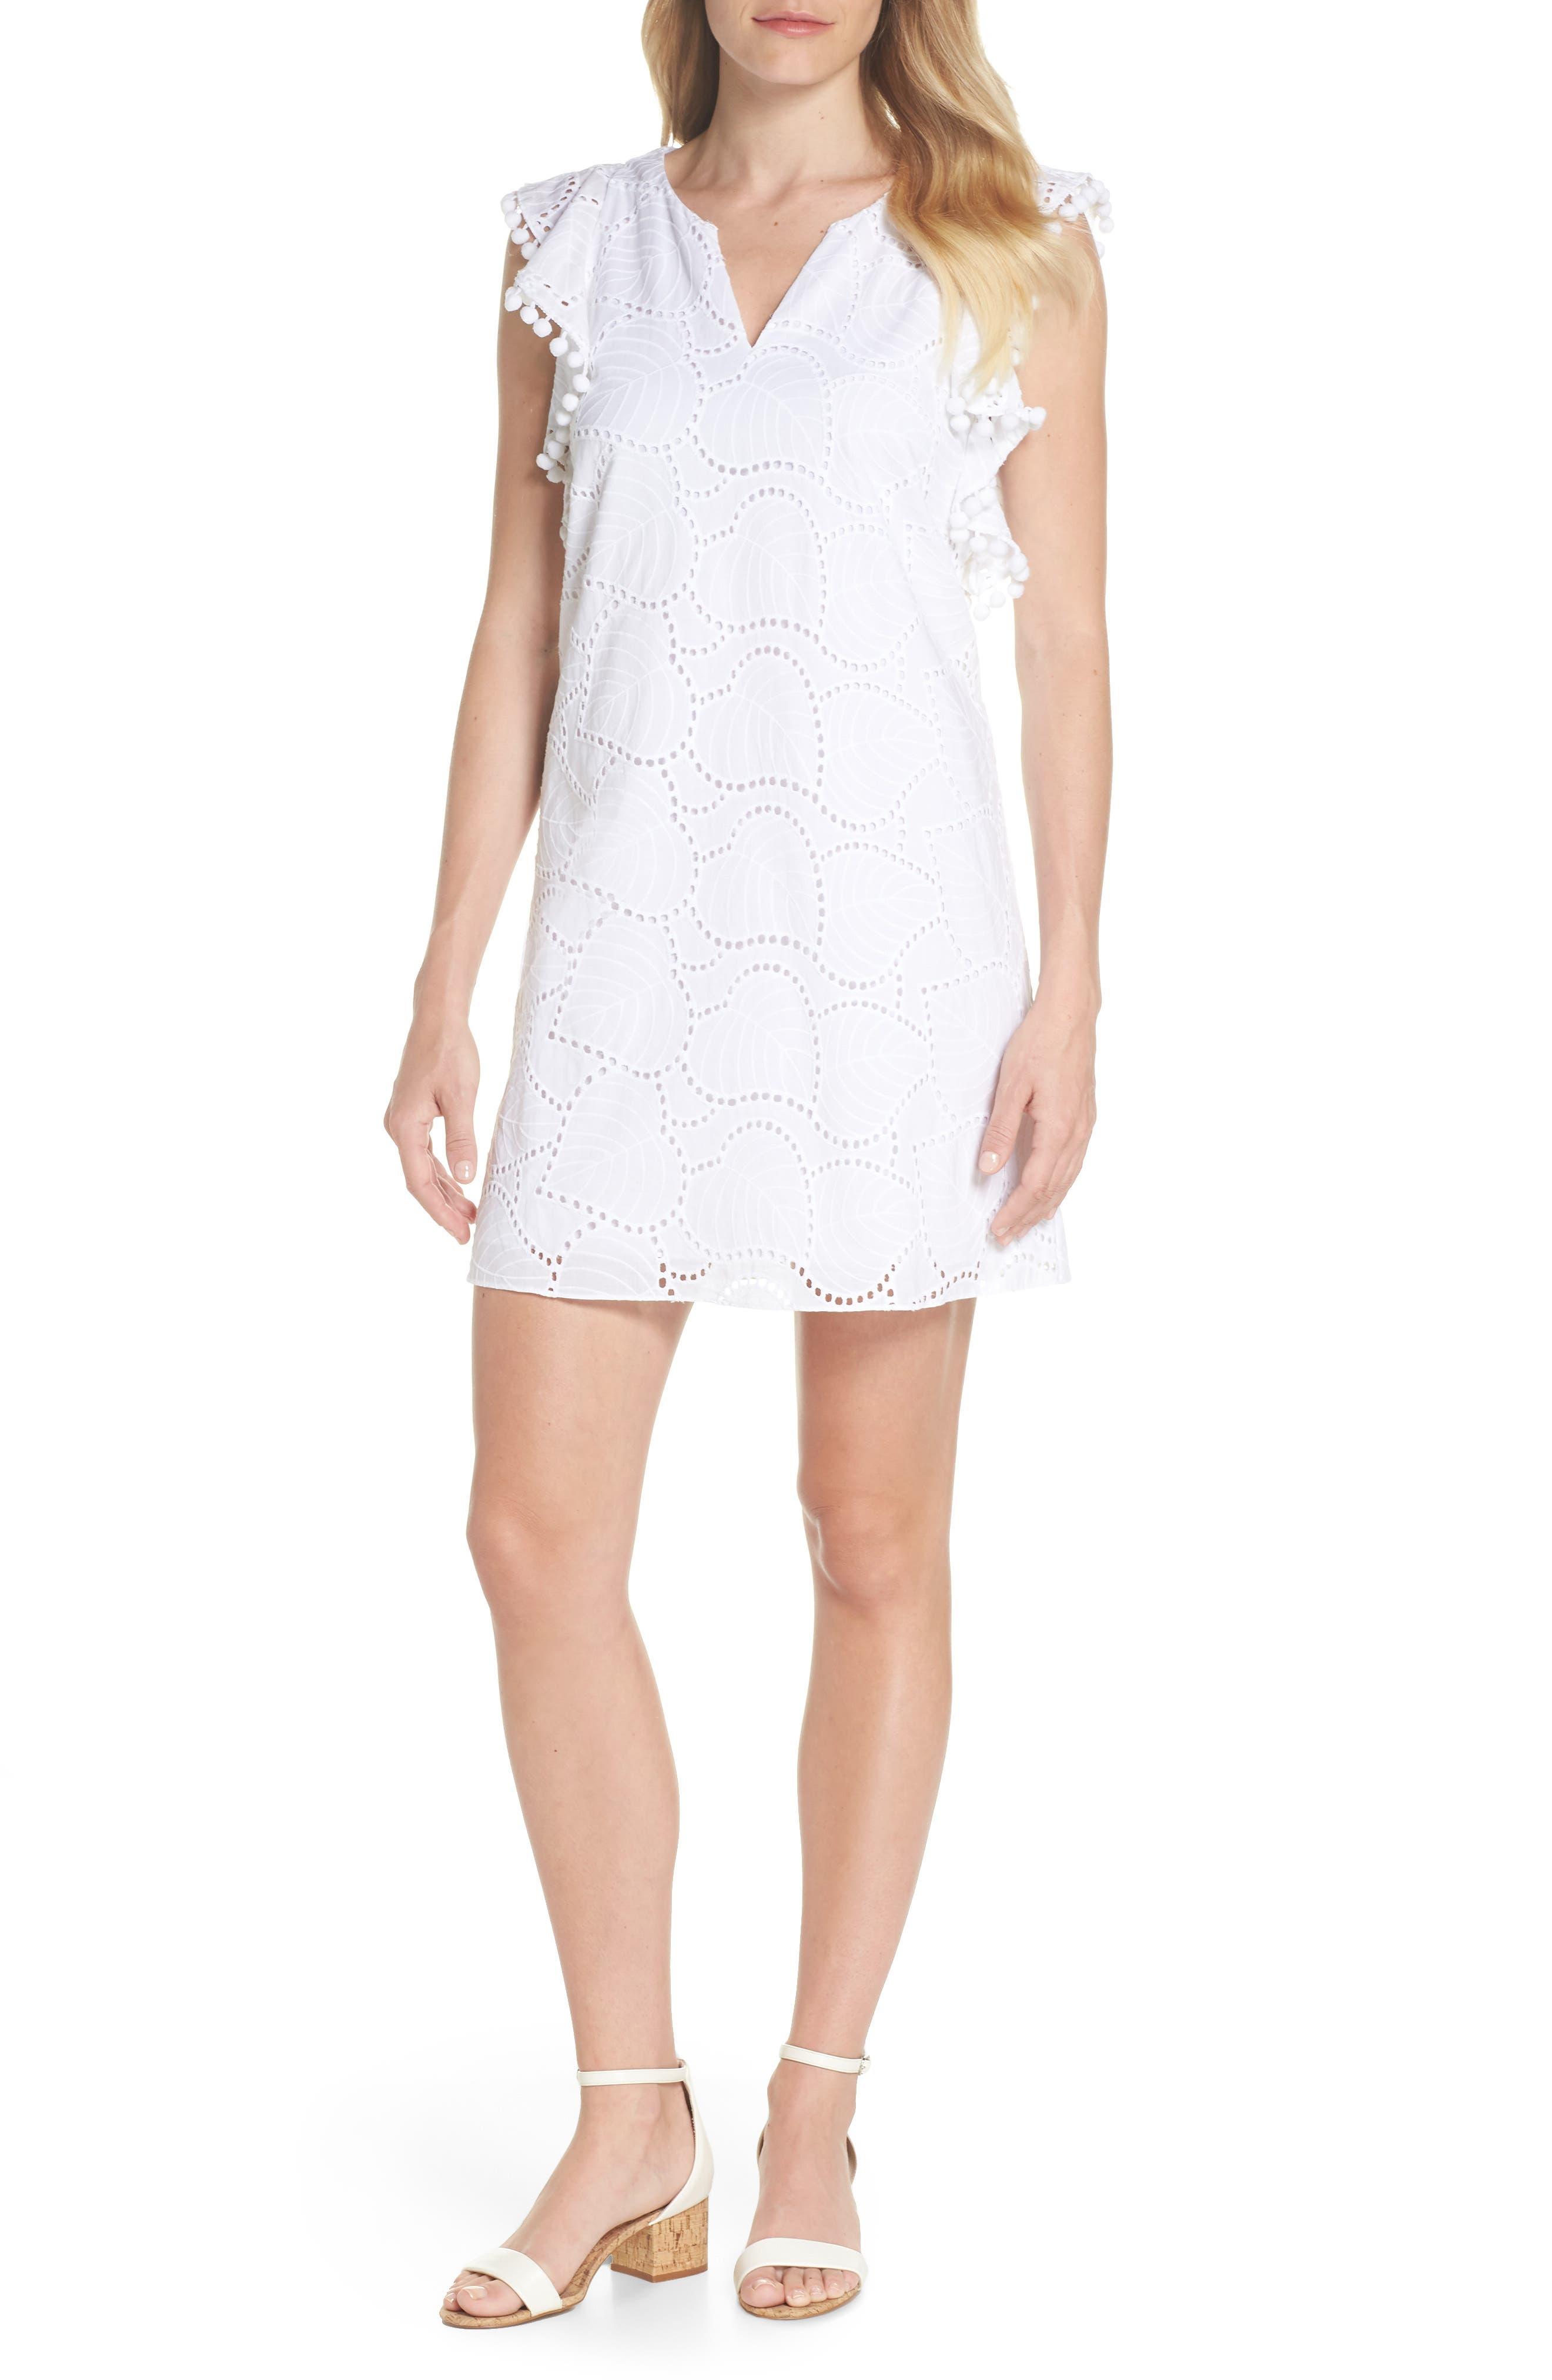 Astara Cotton Eyelet Dress,                             Main thumbnail 1, color,                             Resort White Leaf Eyelet